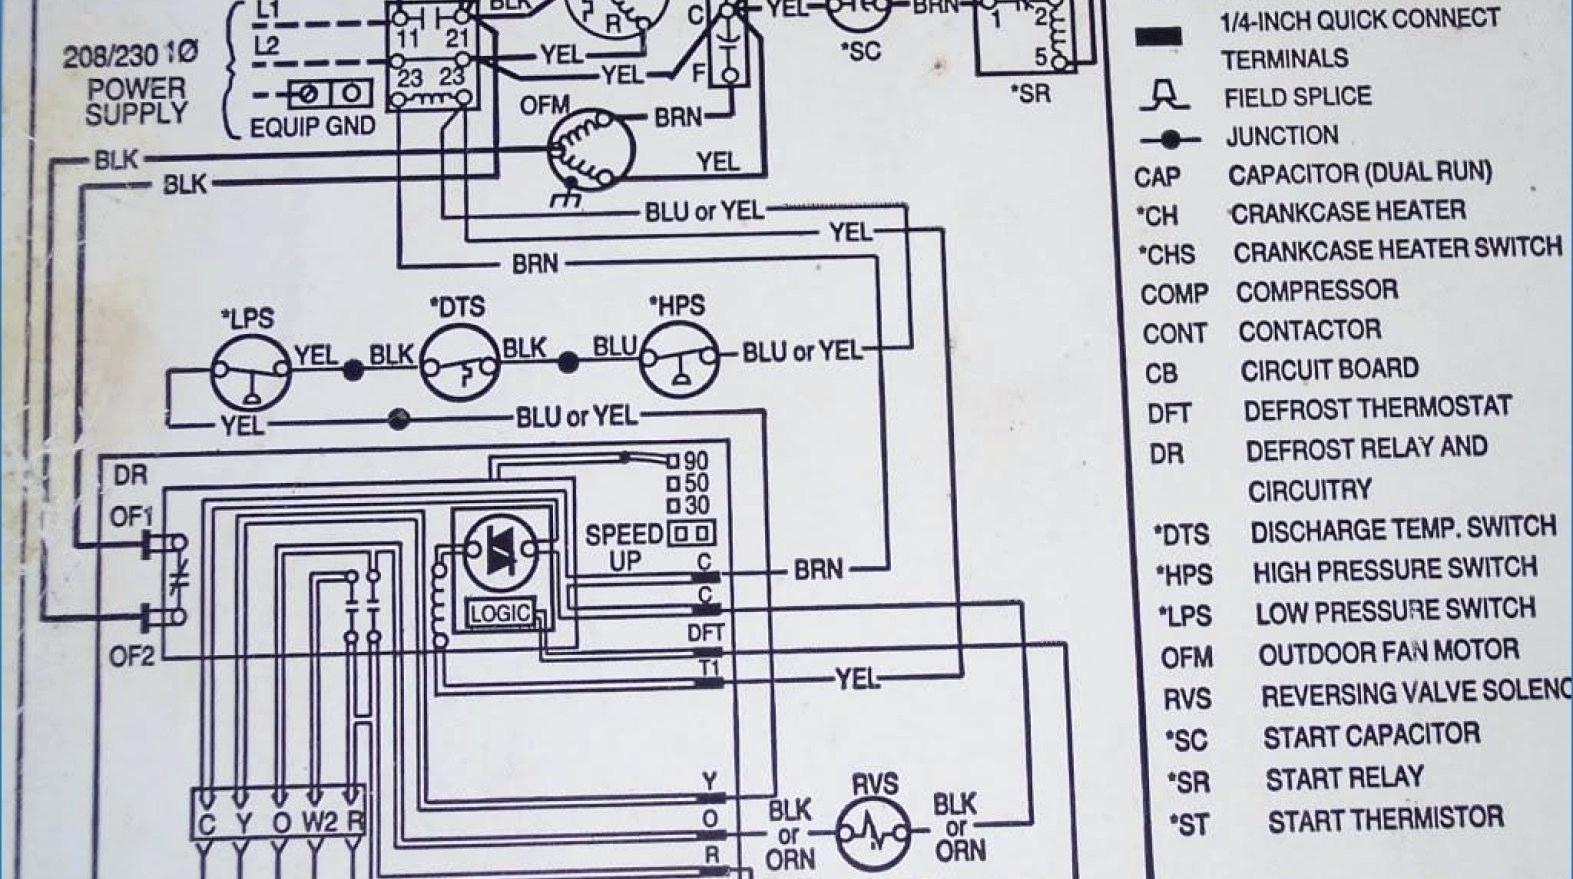 Tecumseh Compressor Wiring Diagram Copeland Electrical Schematic Elegant Image Fantastic Pressor